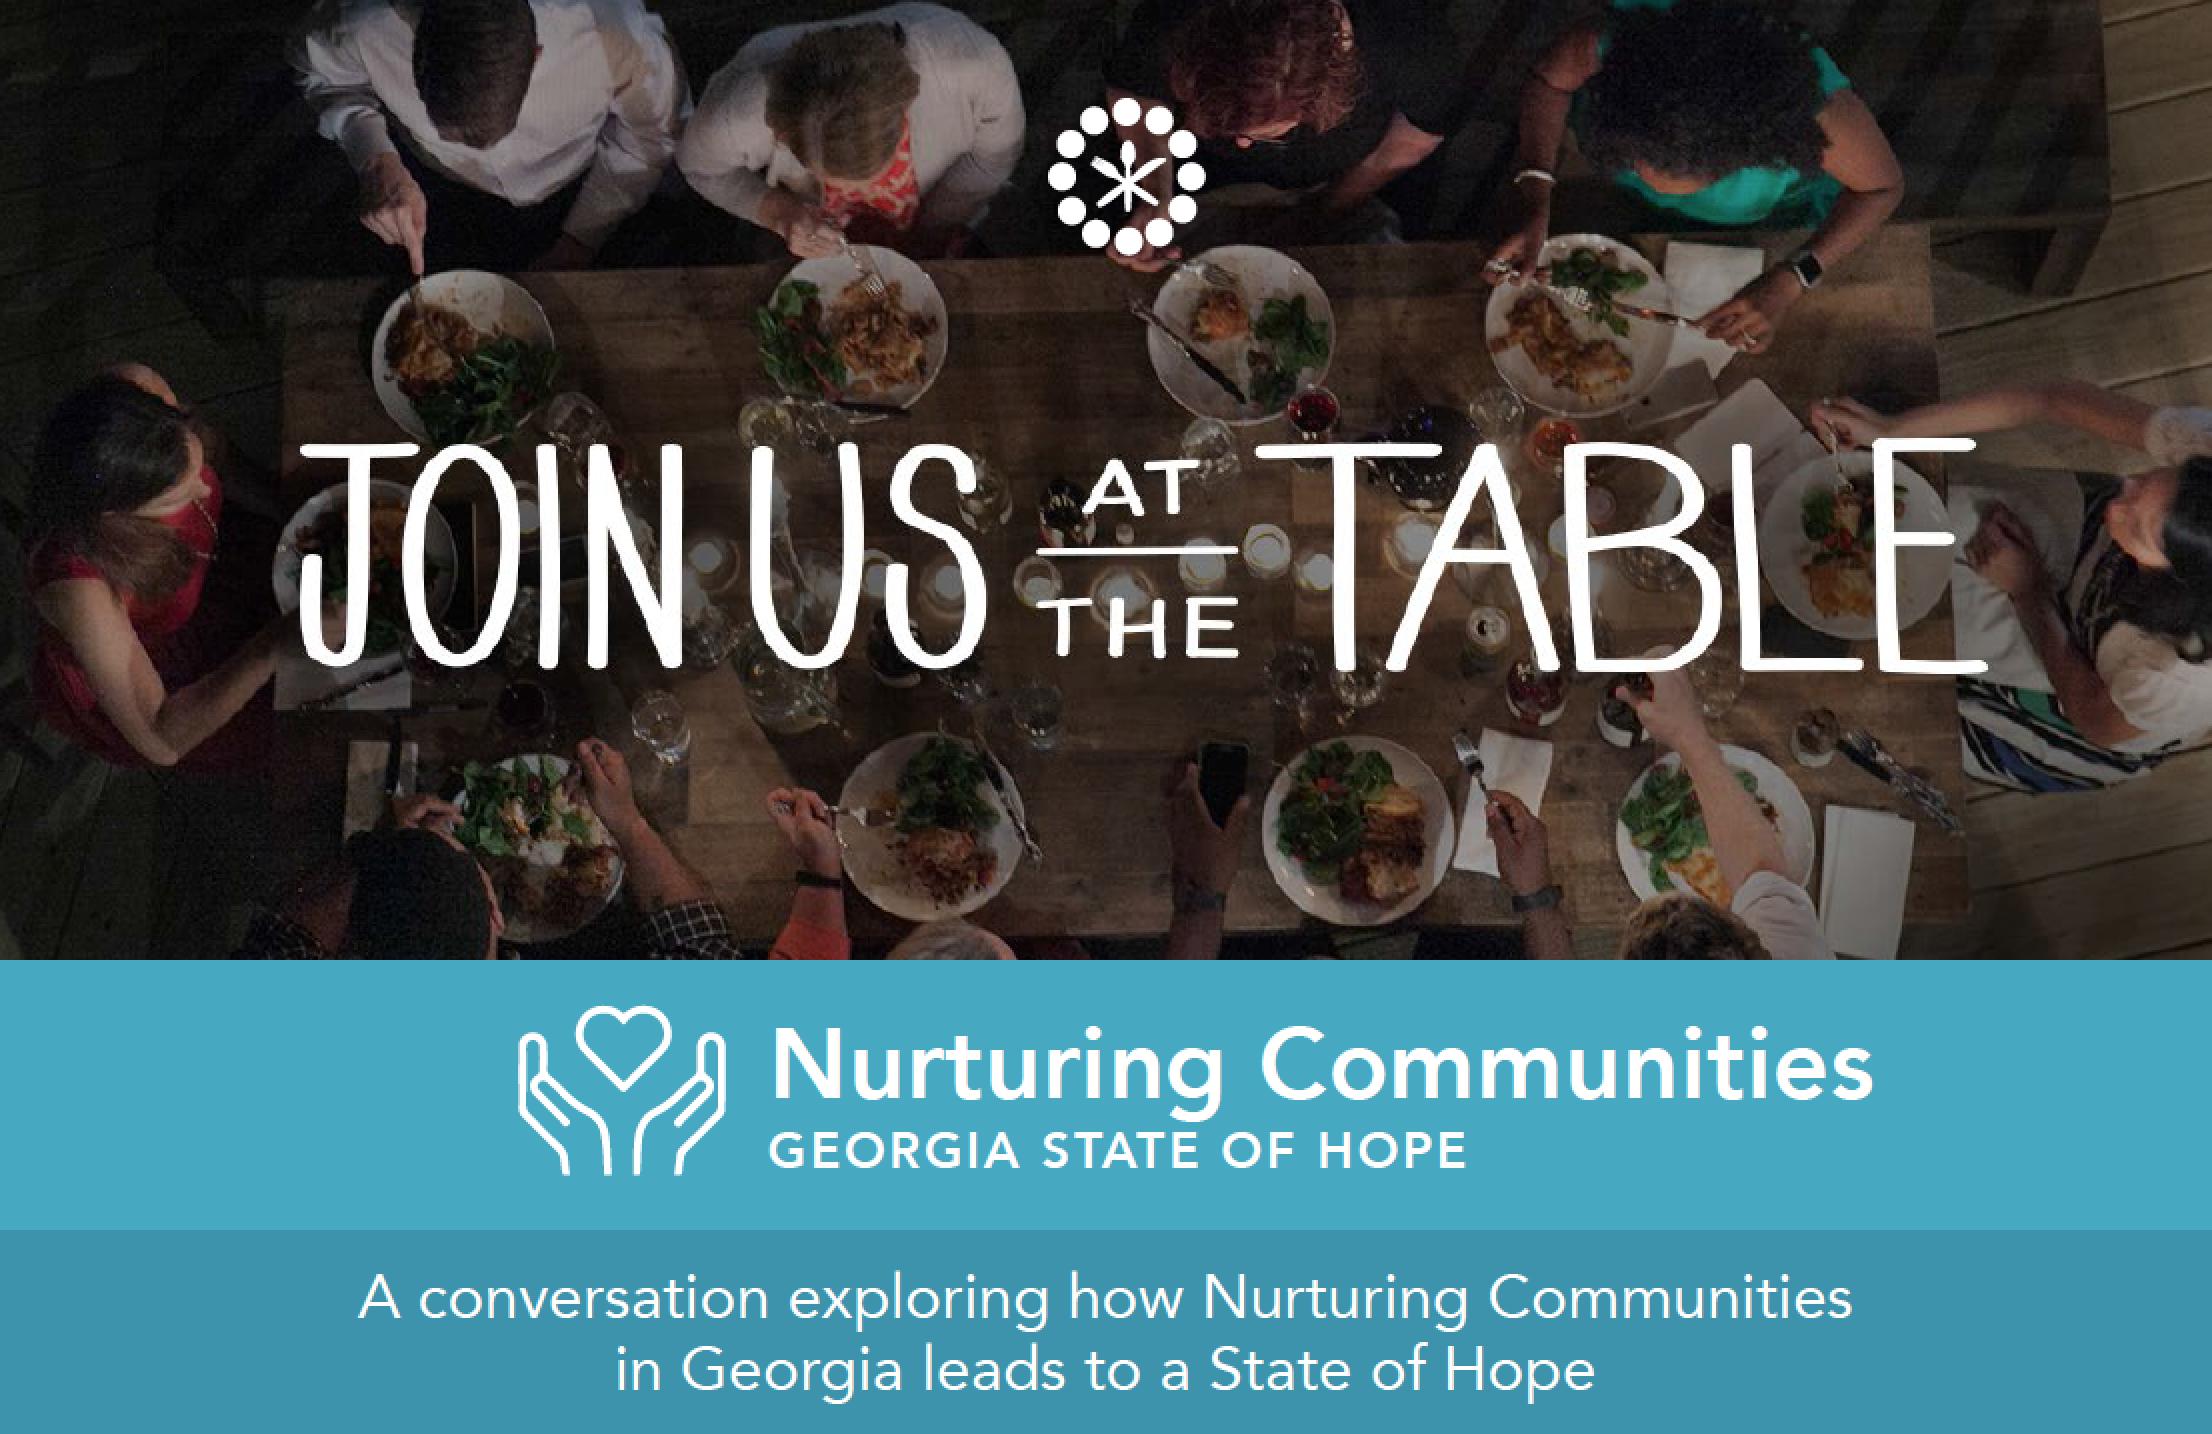 StateofHope-NurturingCommunities.png